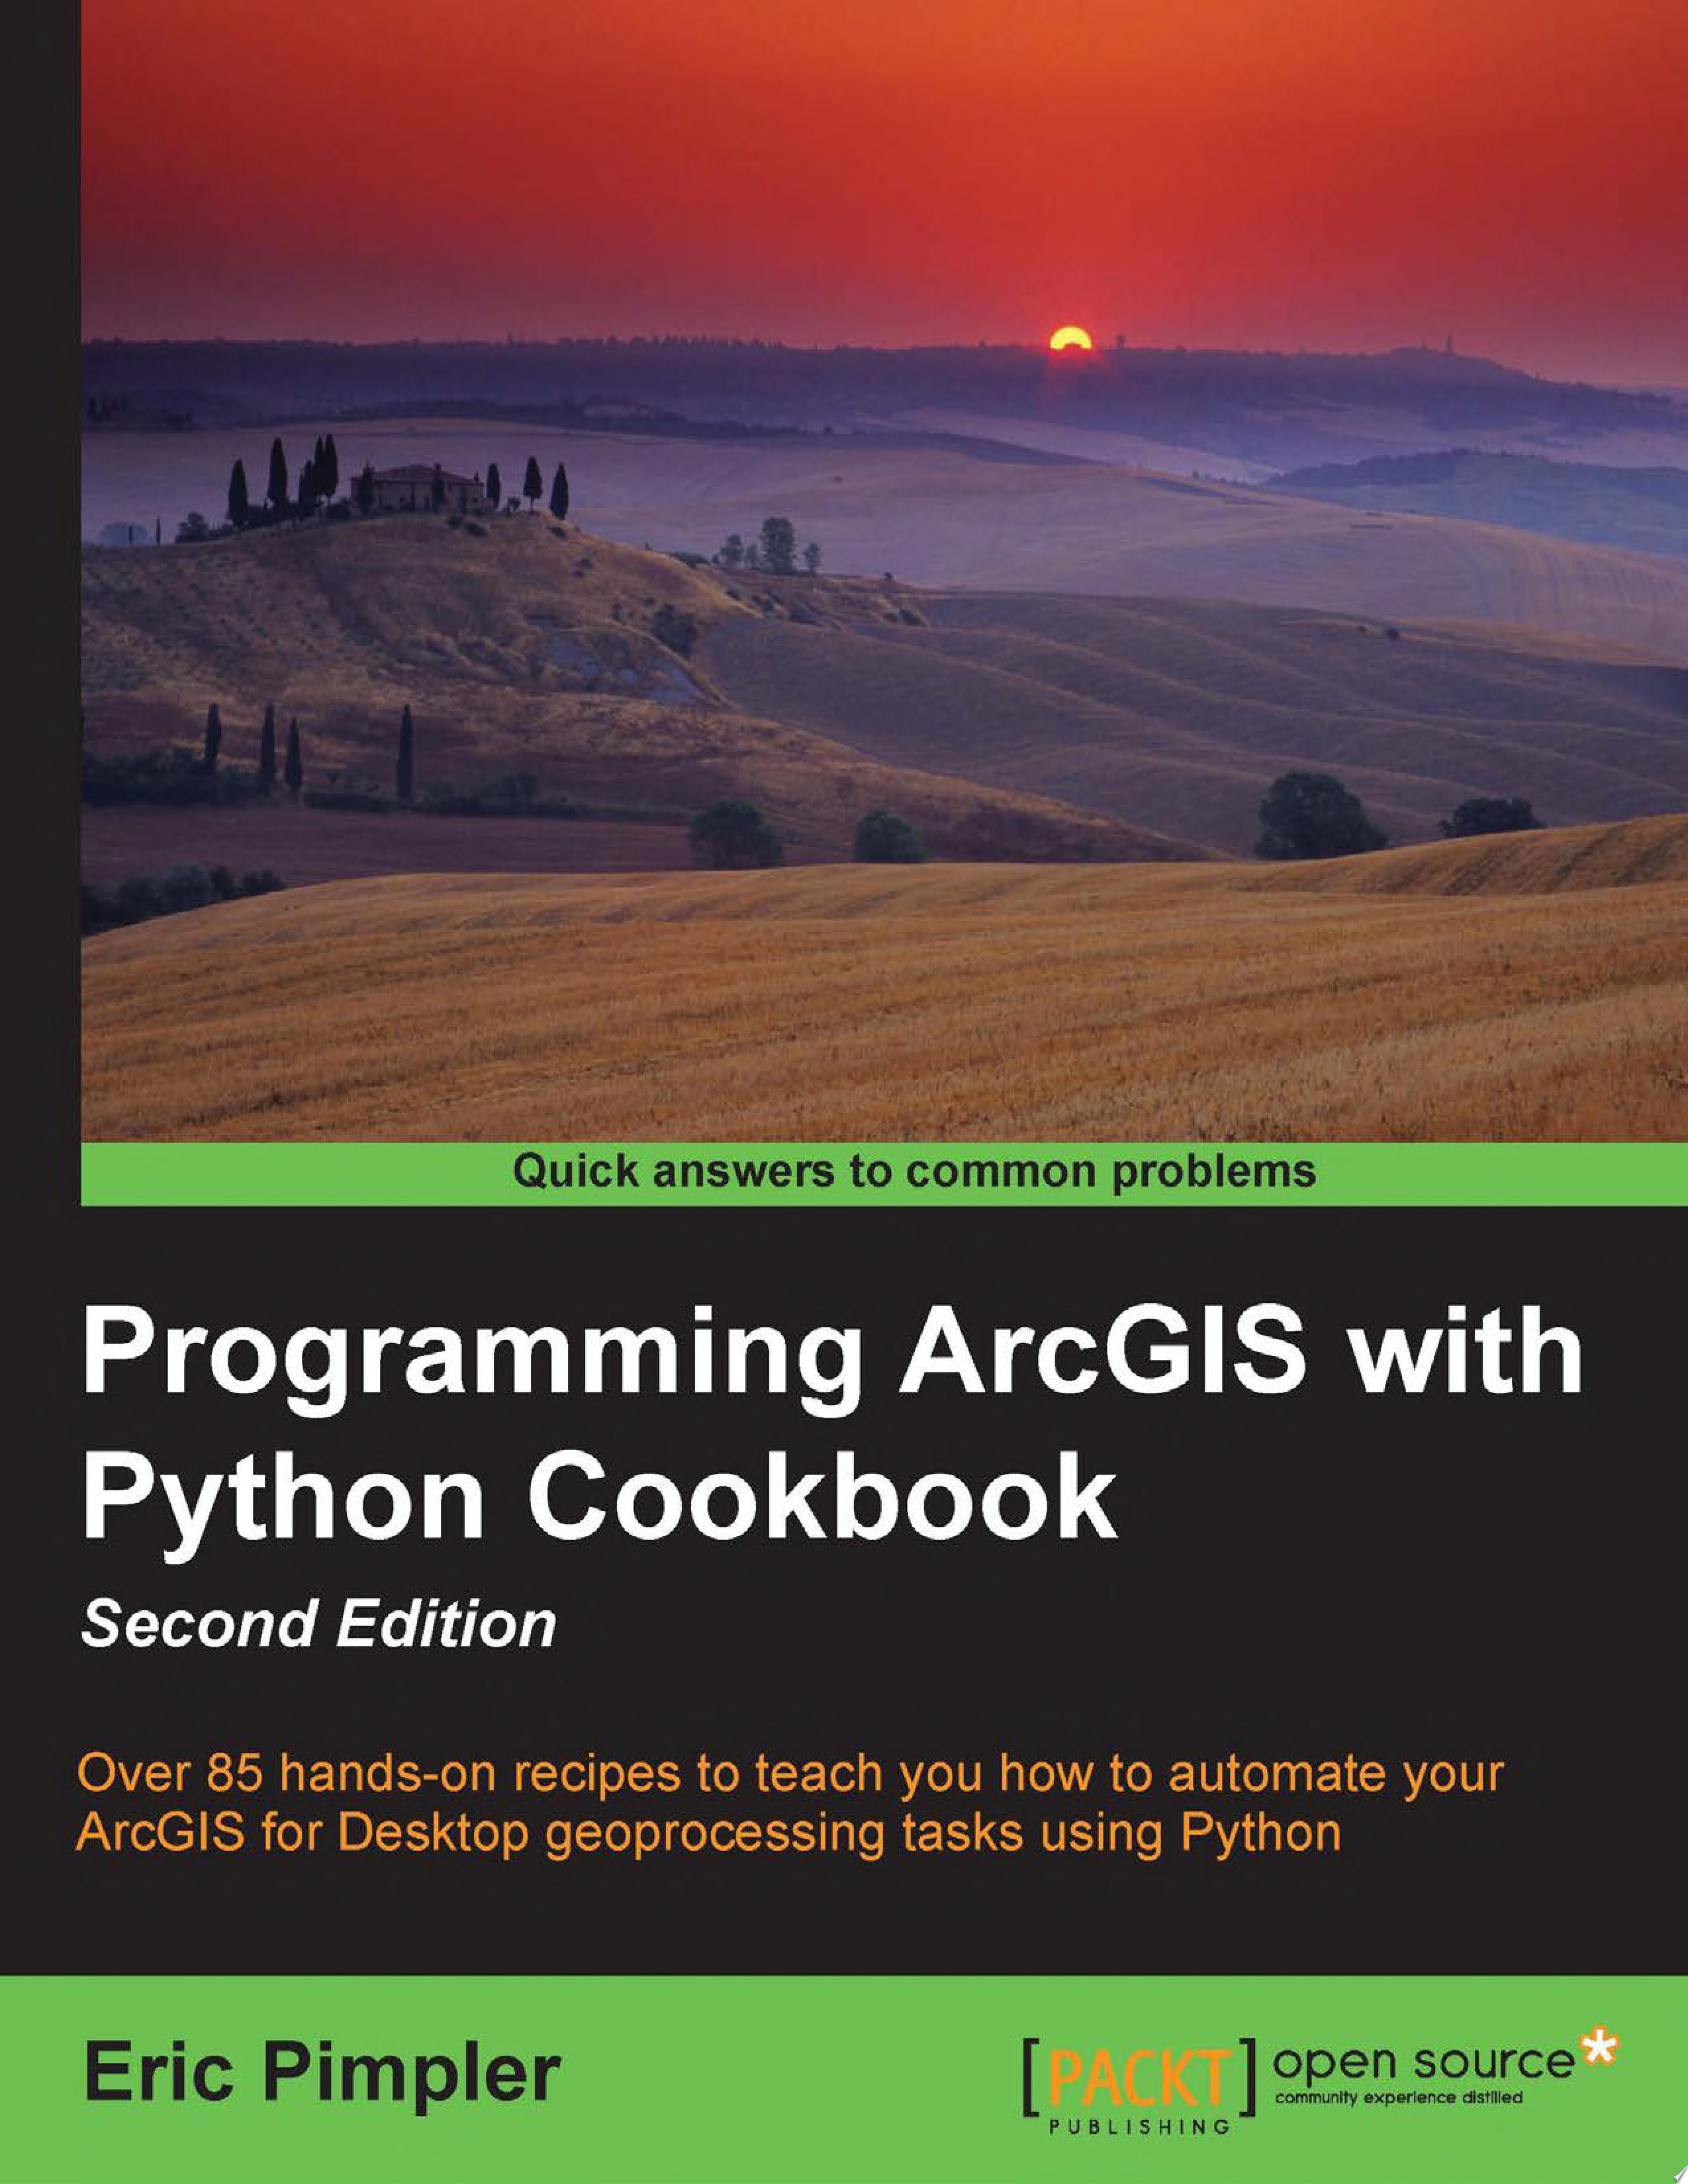 Programming ArcGIS with Python Cookbook